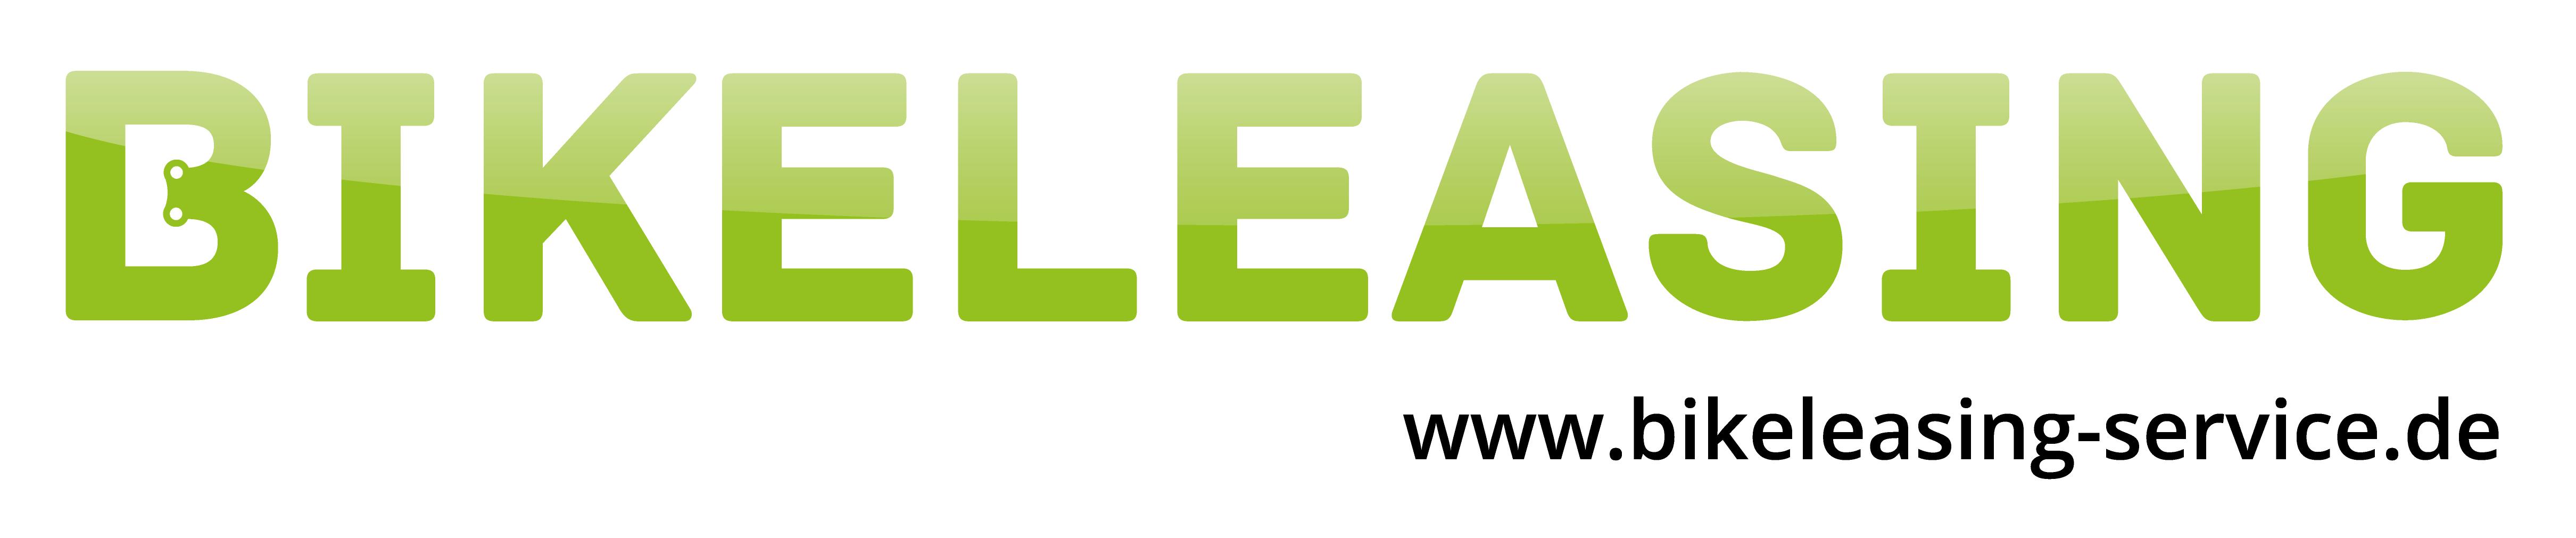 logo_bikeleasing_service_2017